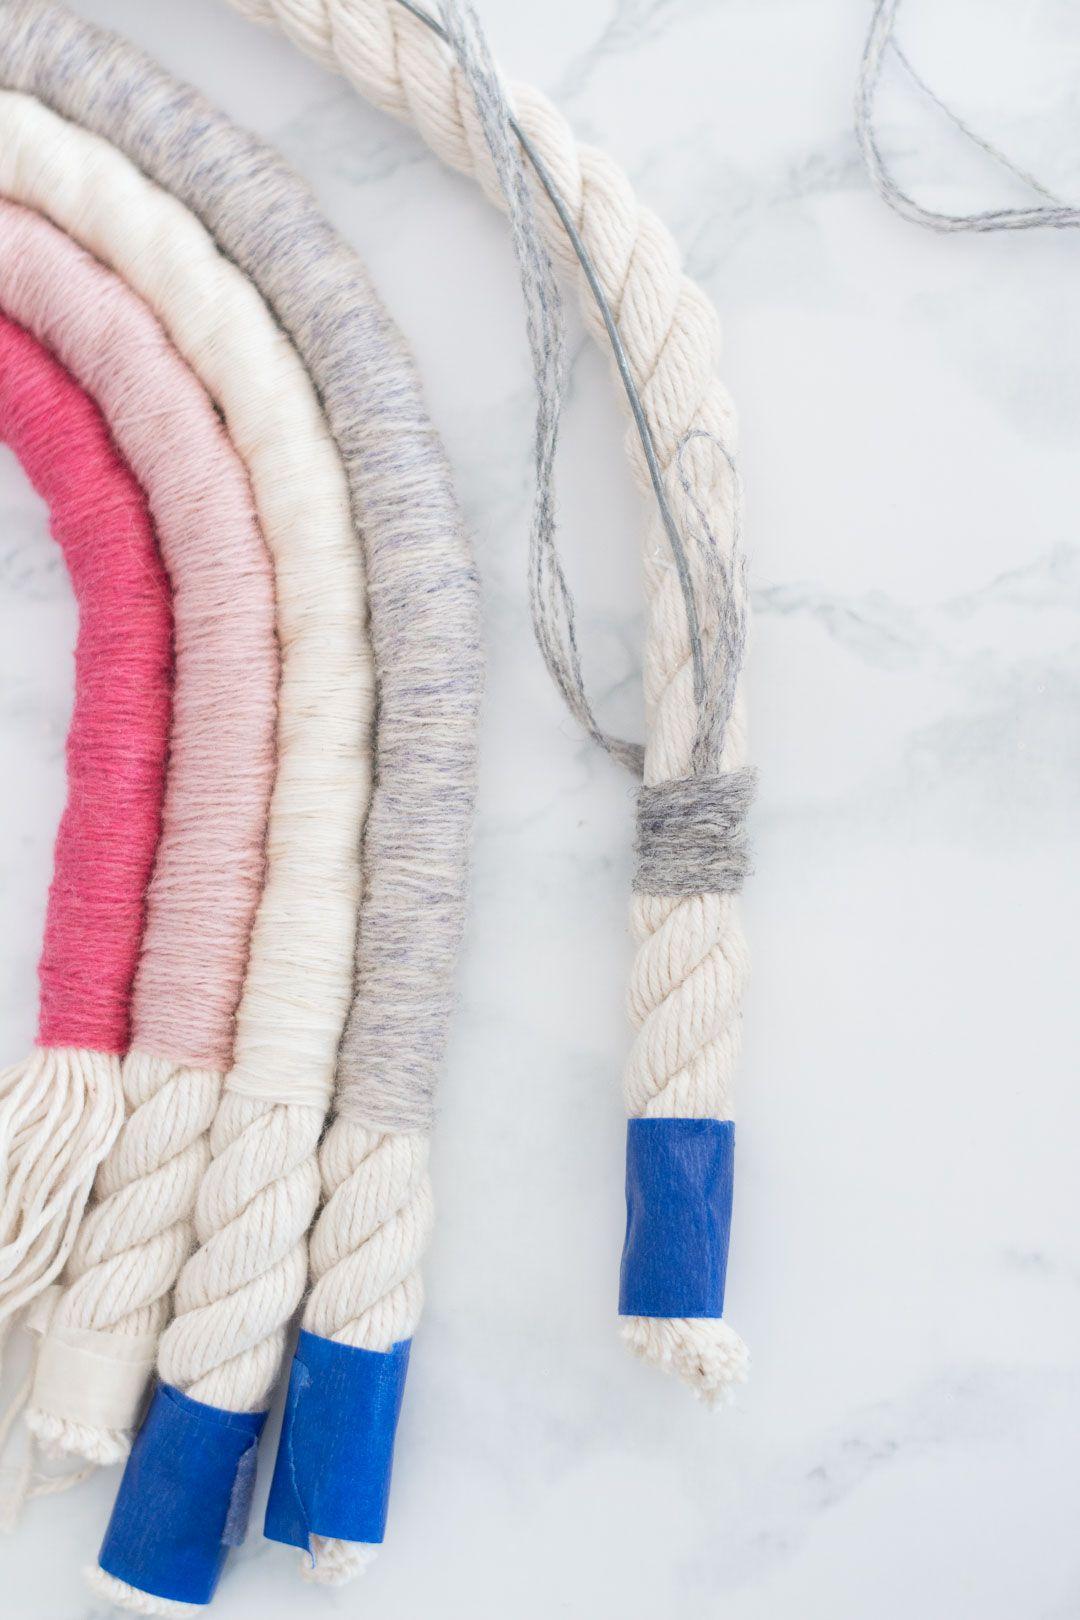 Rope Rainbow Wall Decor // Fibre Art DIY